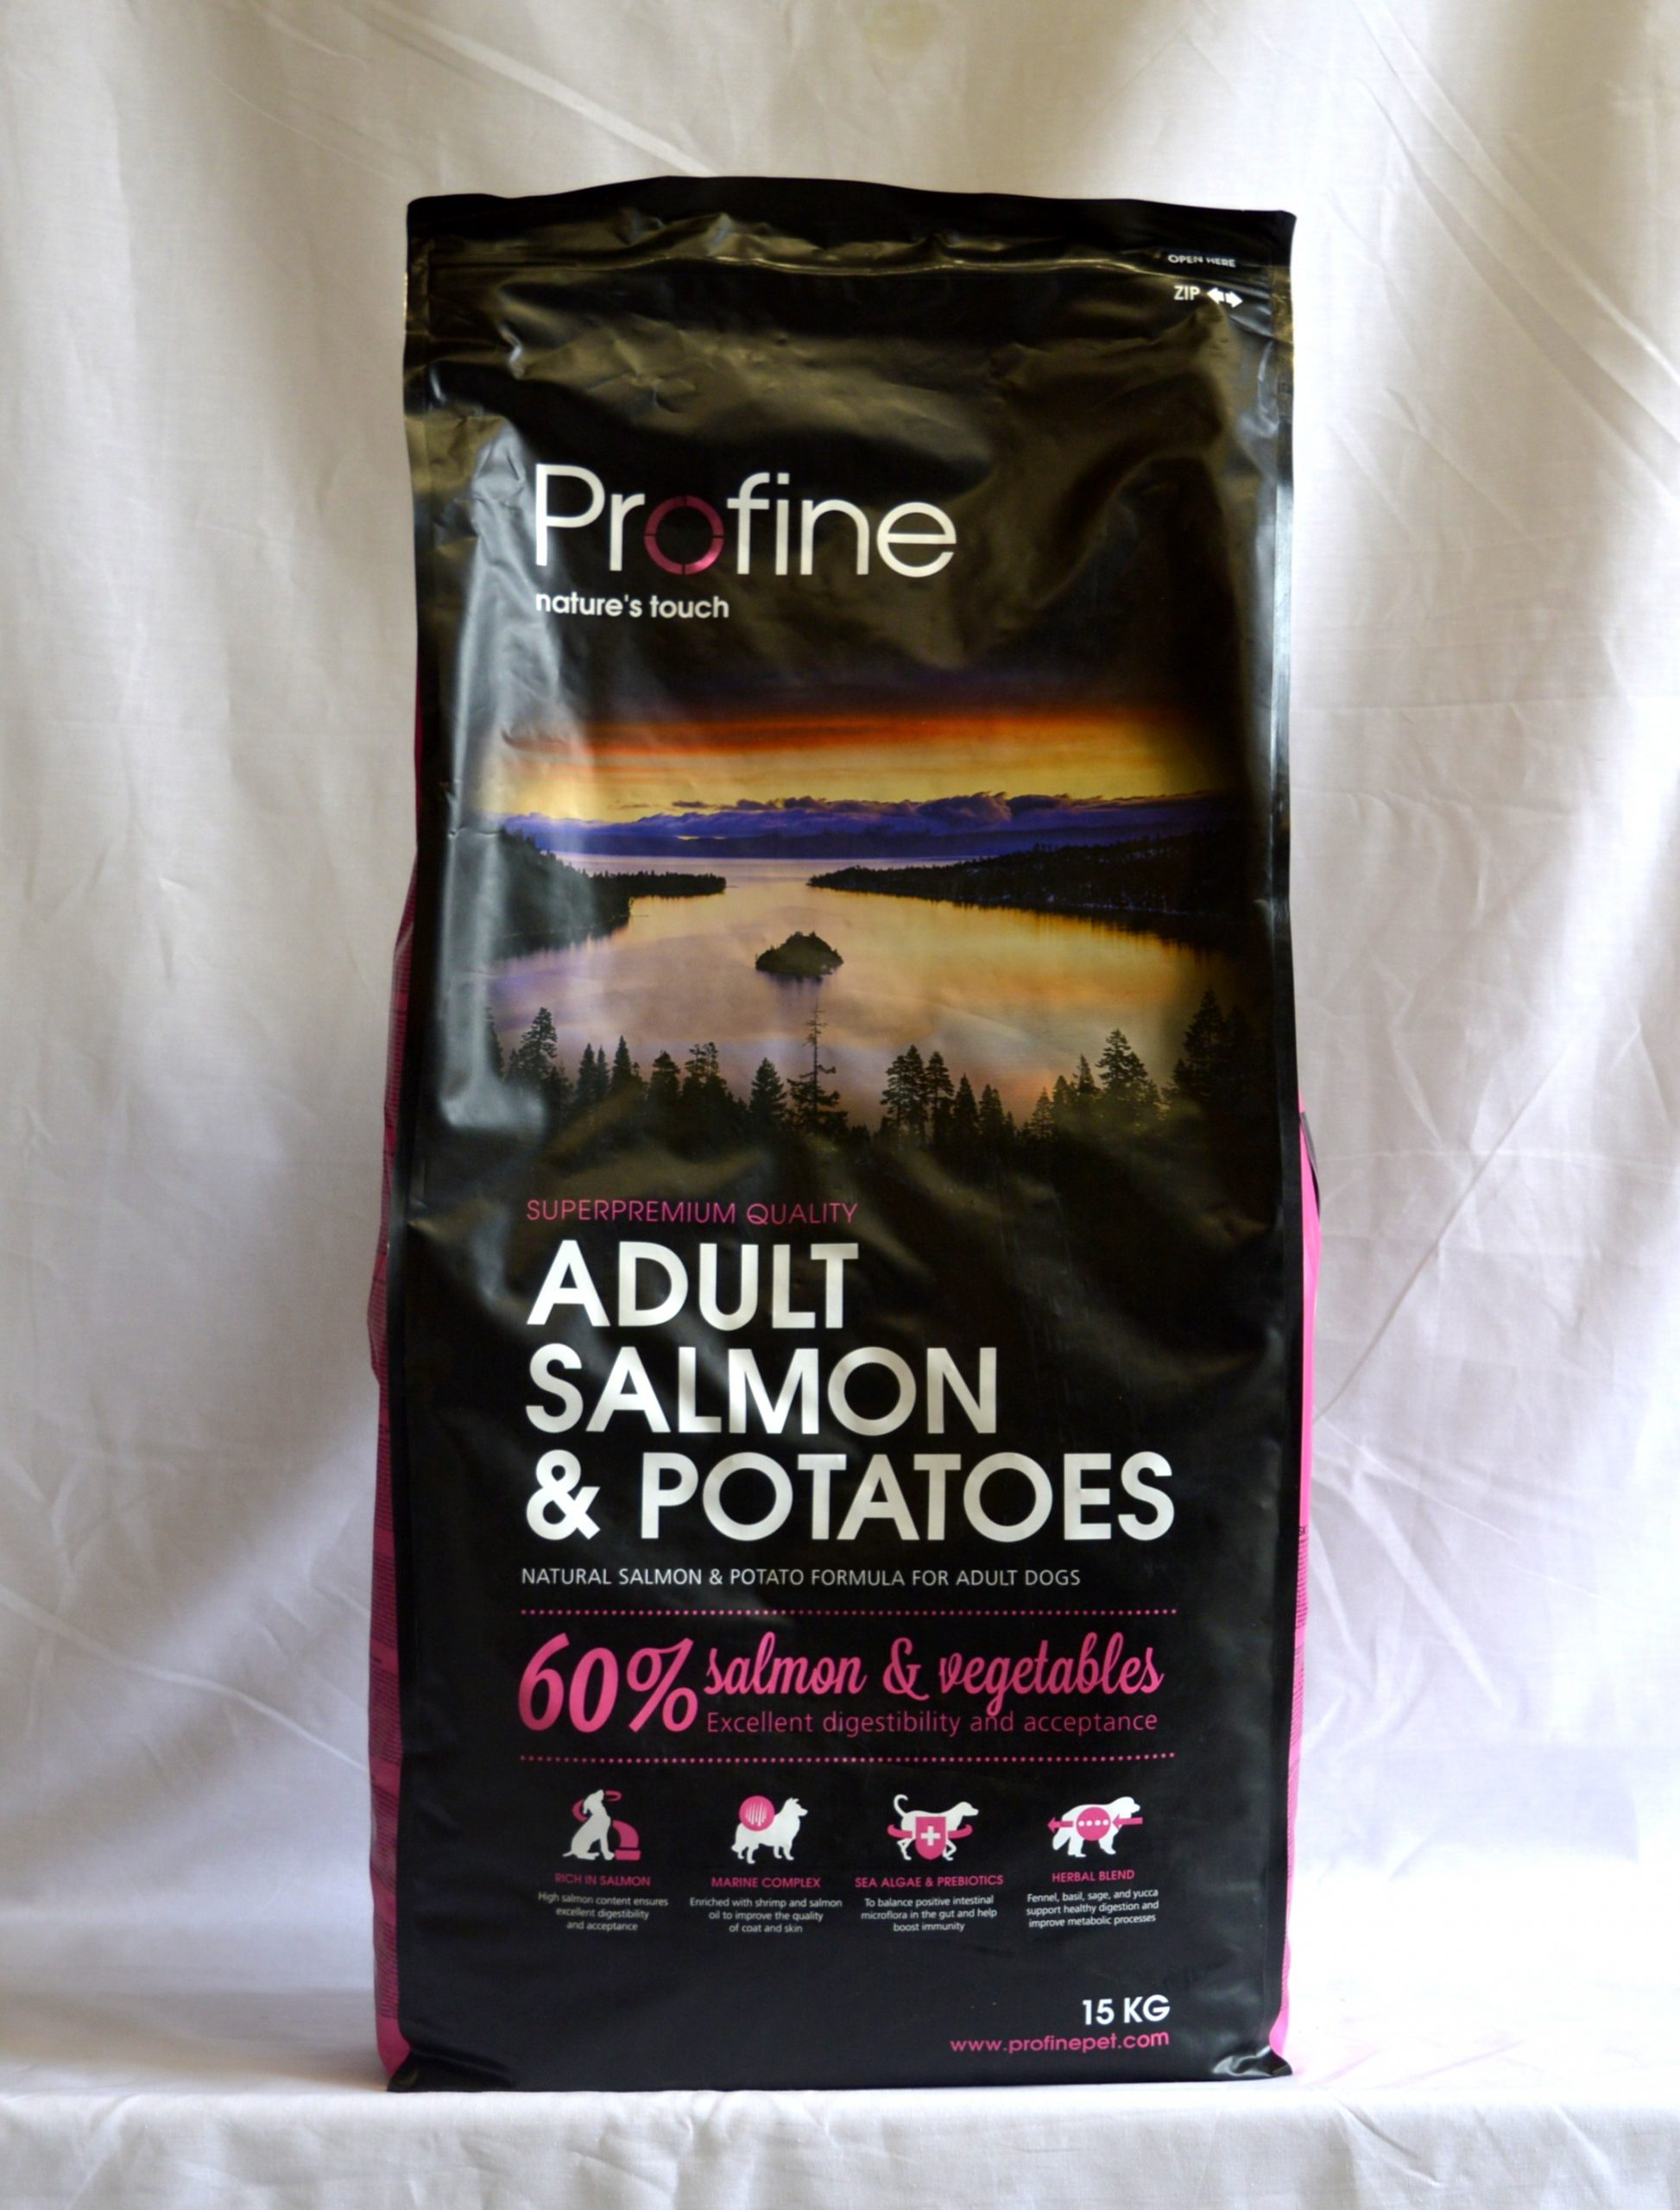 Profine Salmon & Potatoes Adult-15kg